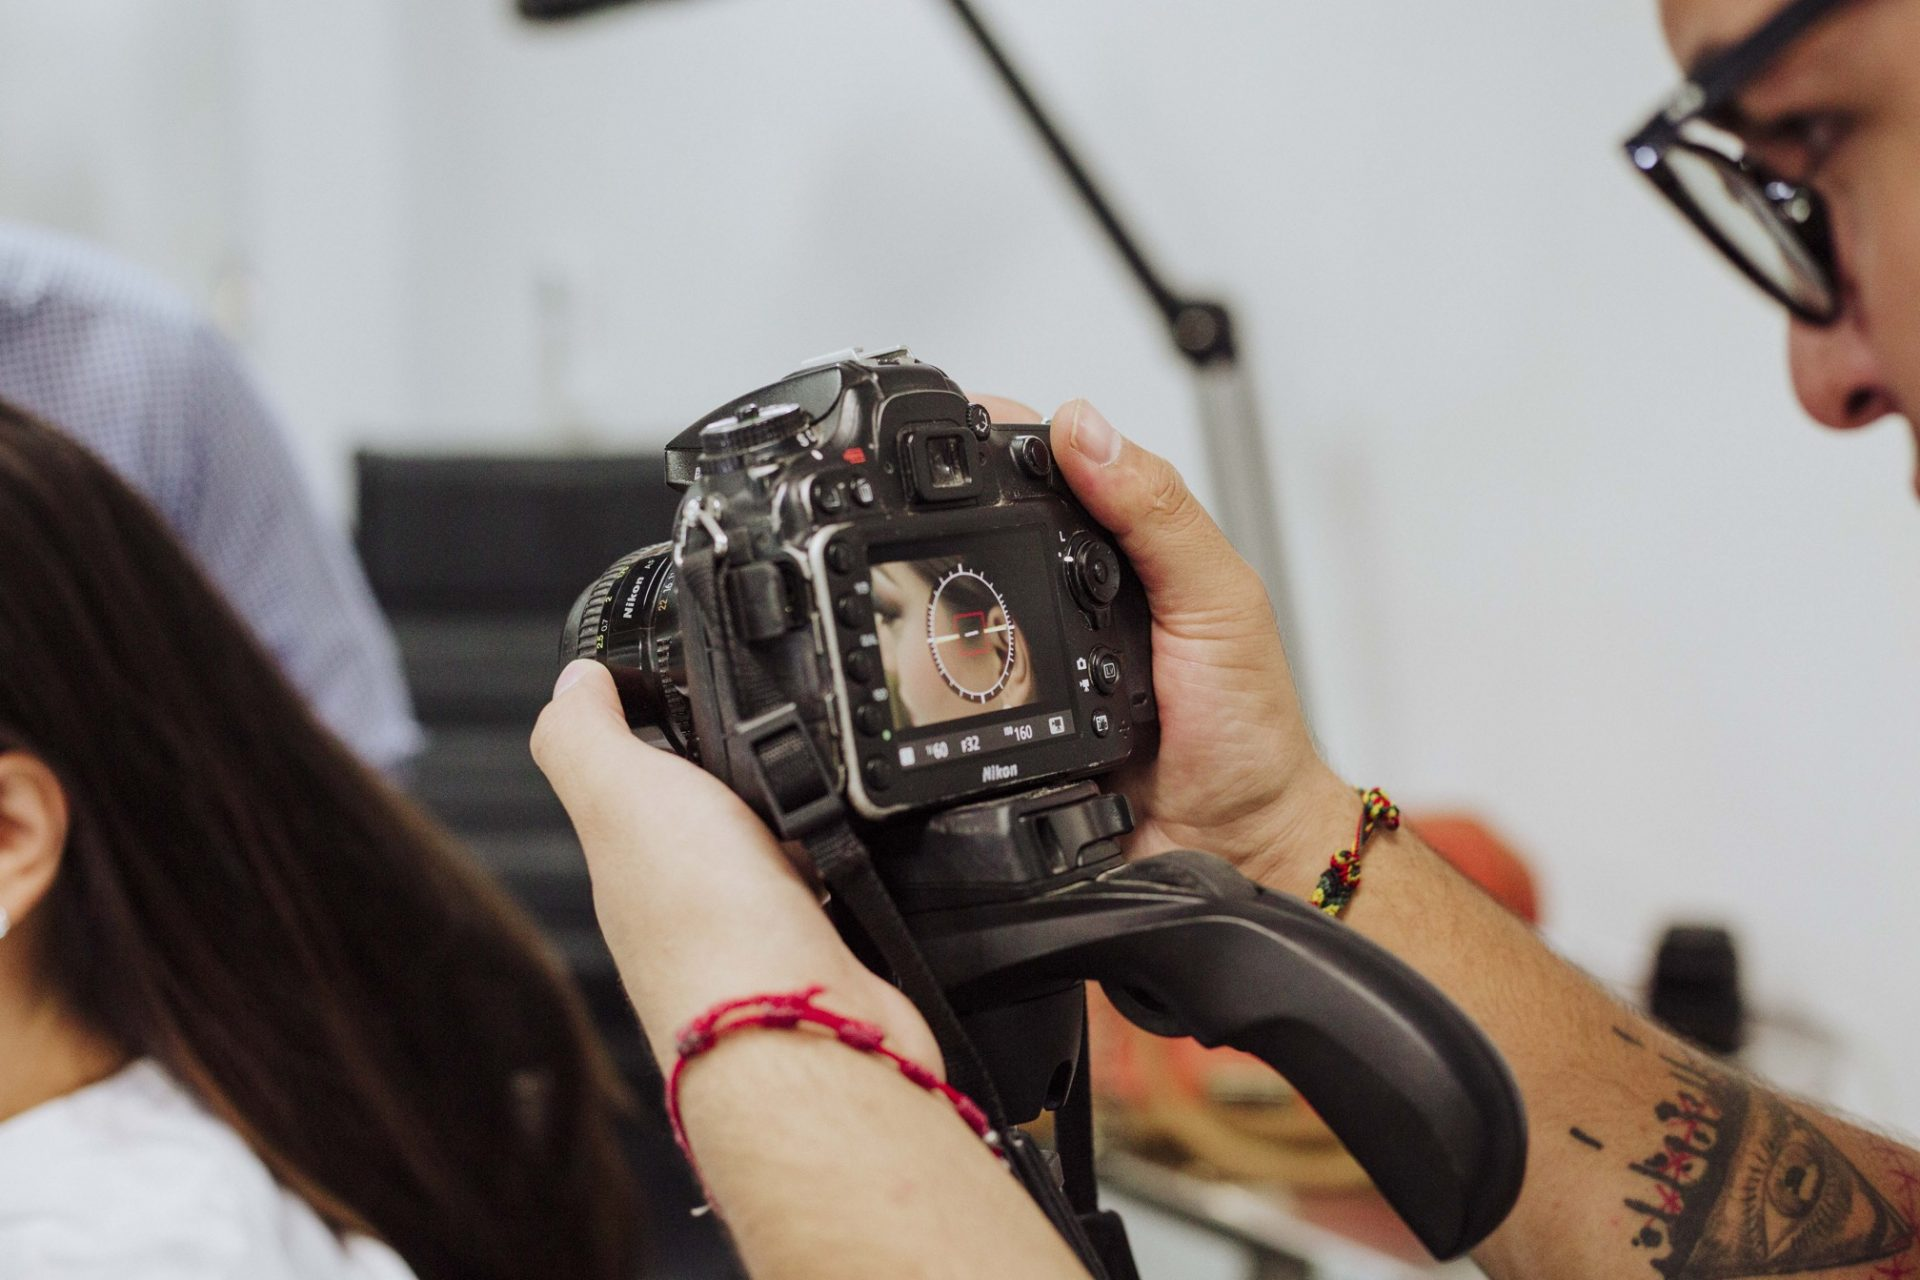 fotografo_profesional_zacatecas_chihuahua_bodas_xv_mexico-7